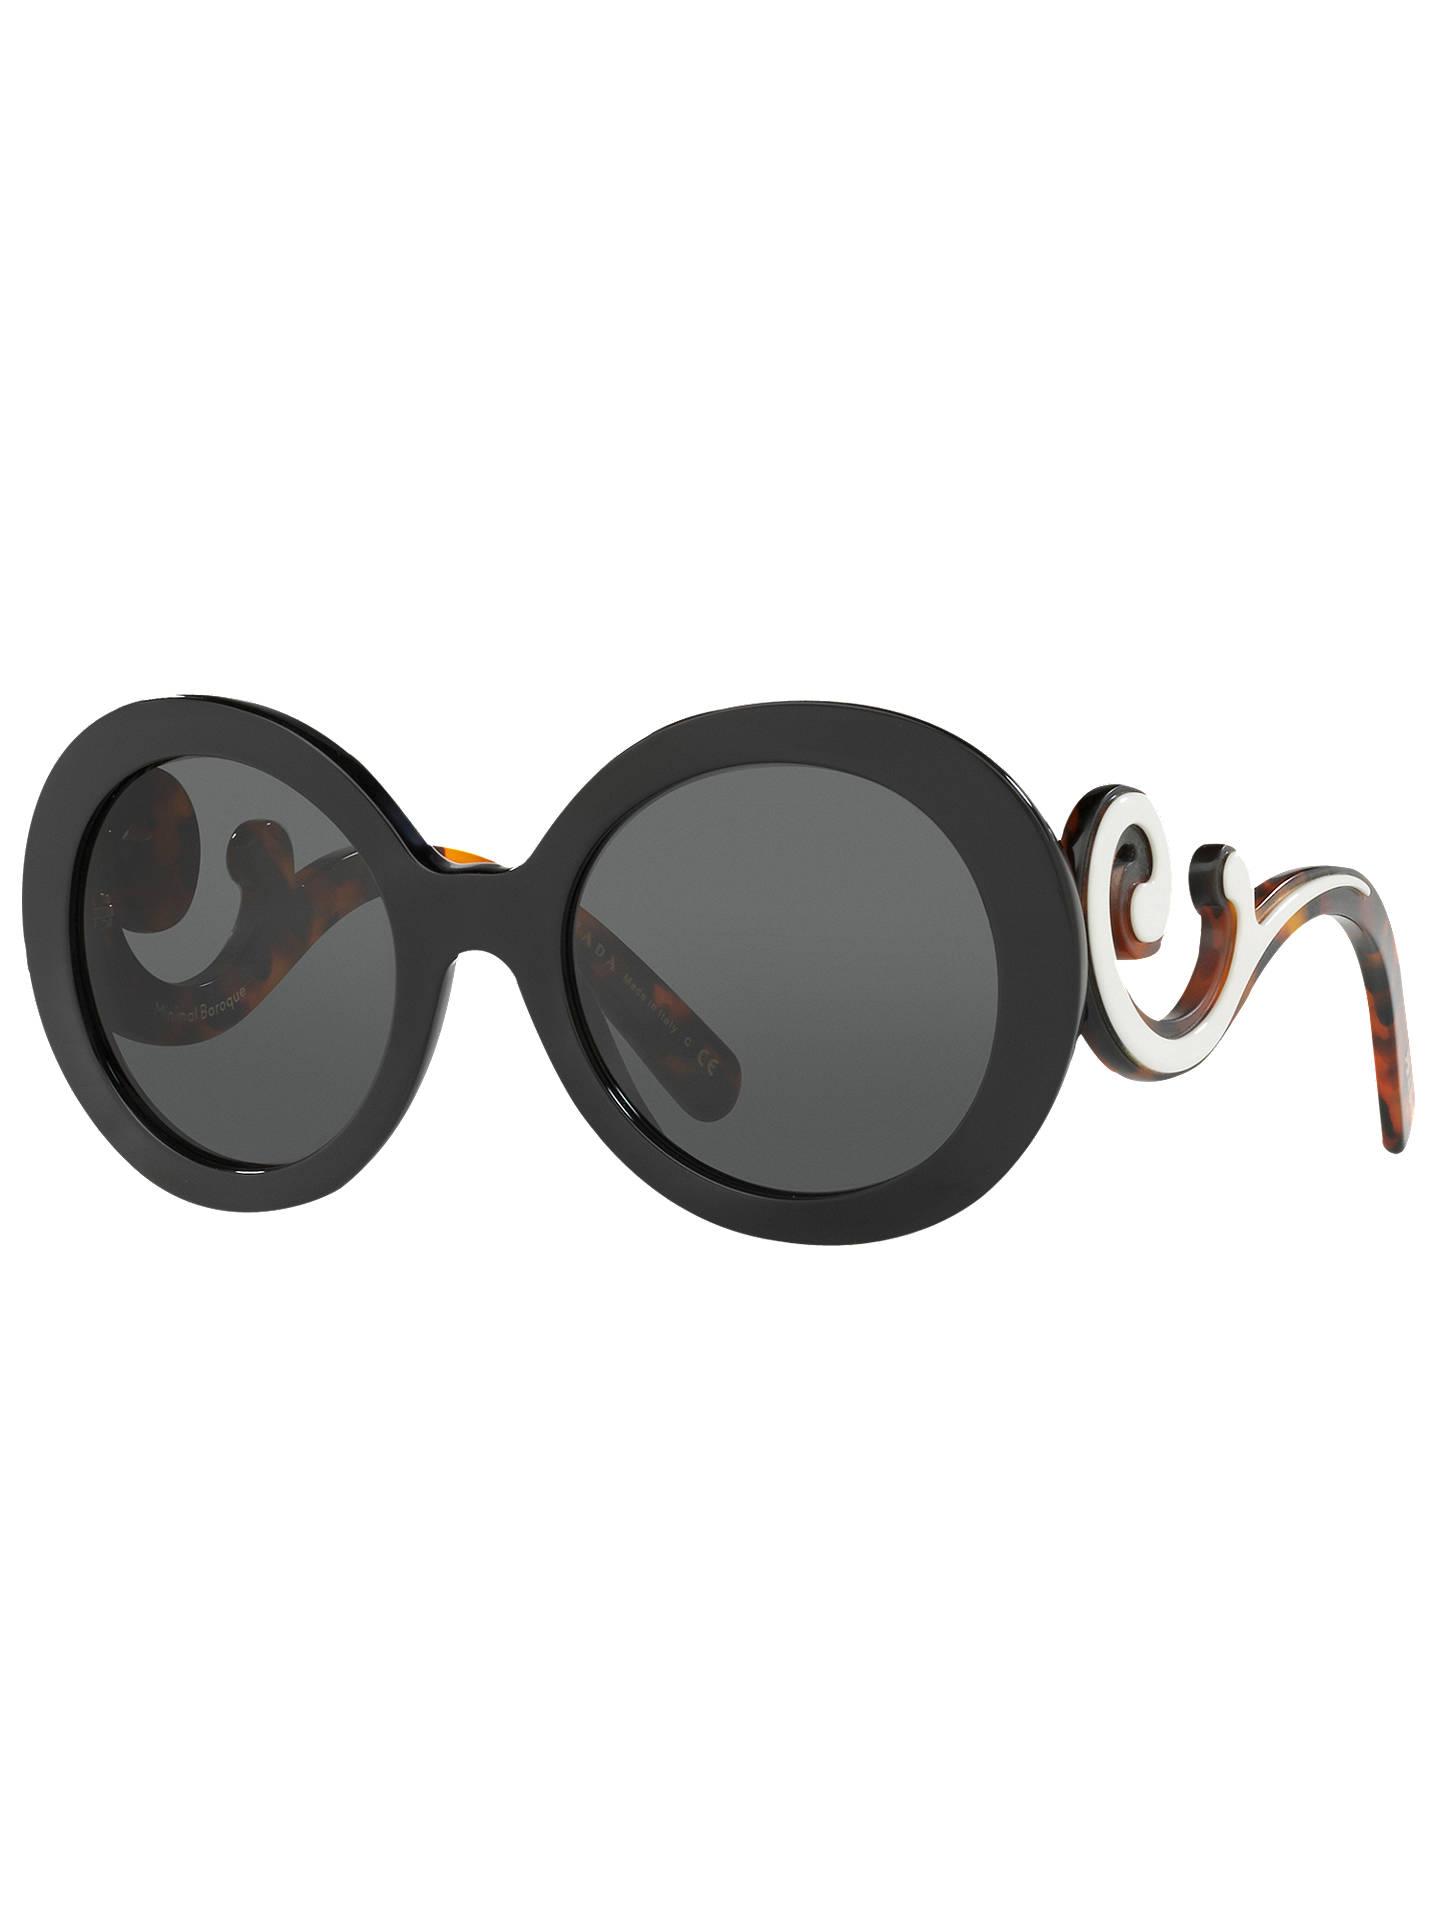 259d54c5223f ... ireland buyprada pr 08ts minimal baroque round sunglasses black online  at johnlewis 81a7b 2968f